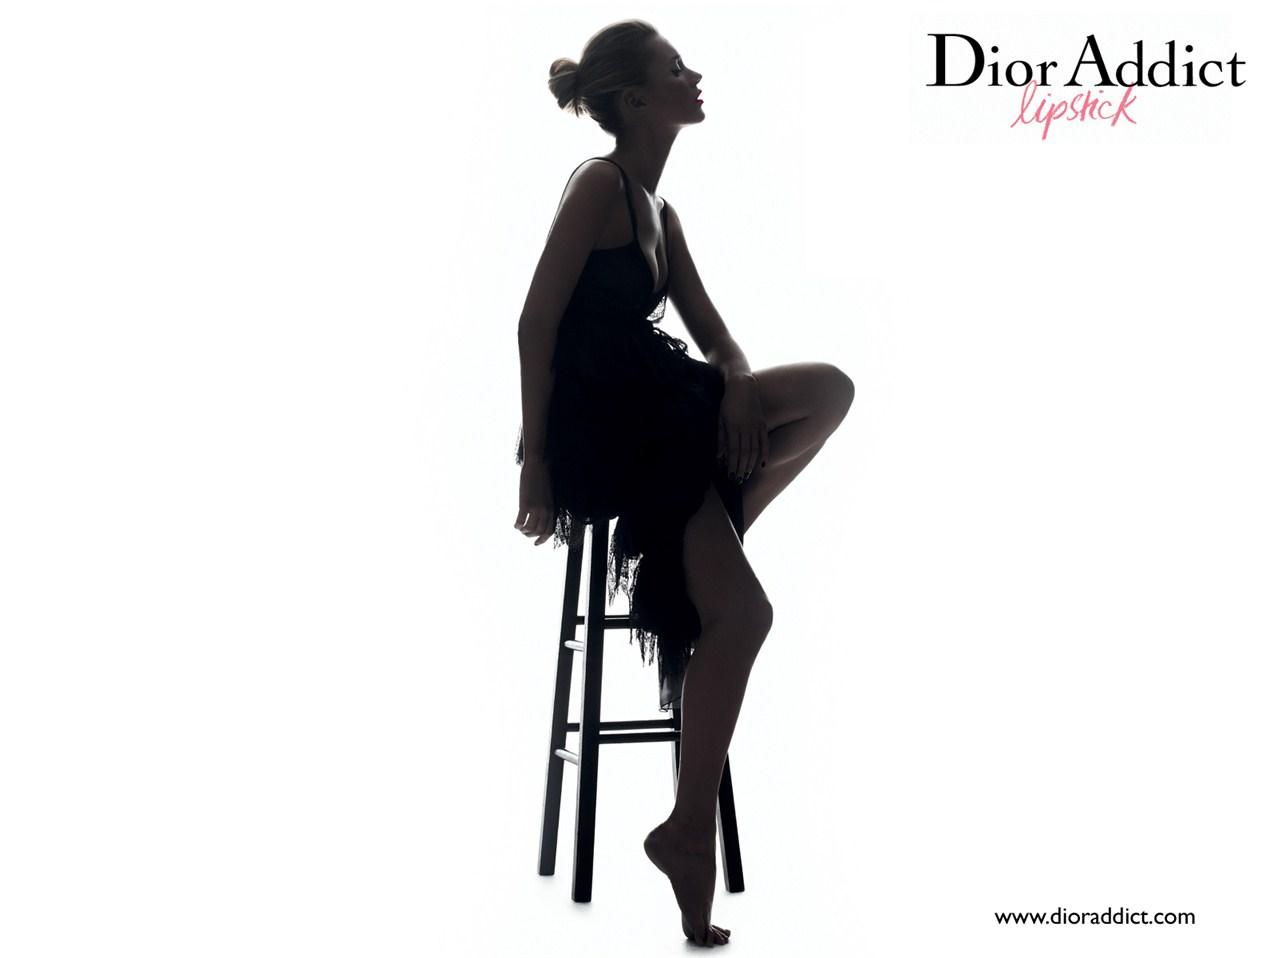 Кейт Мосс / Kate Moss by David Sims for Dior Addict